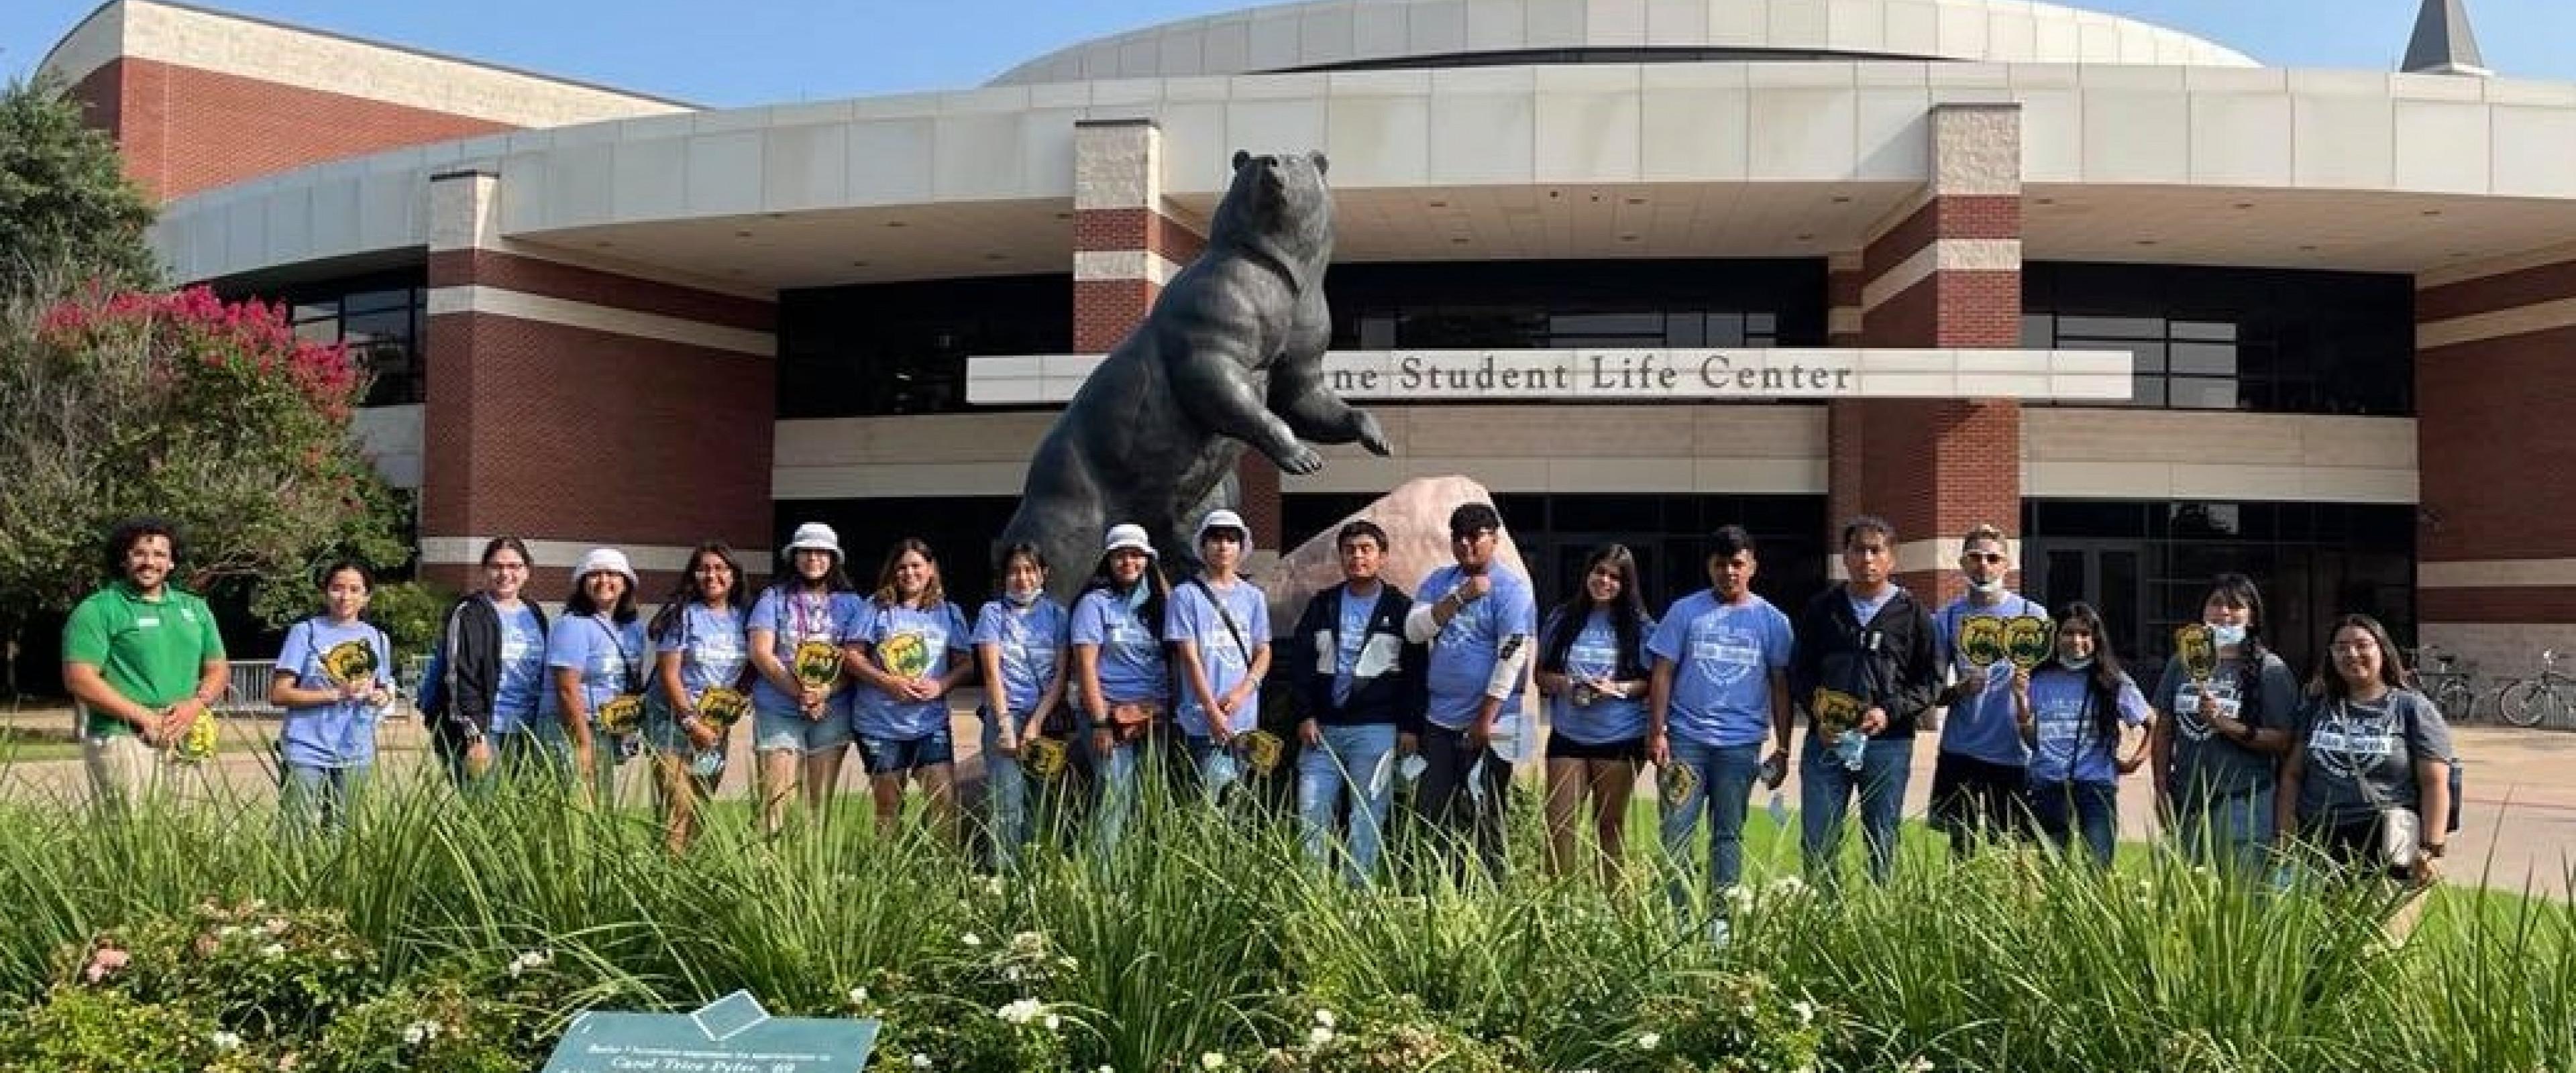 Upward Bound students posing on a trip